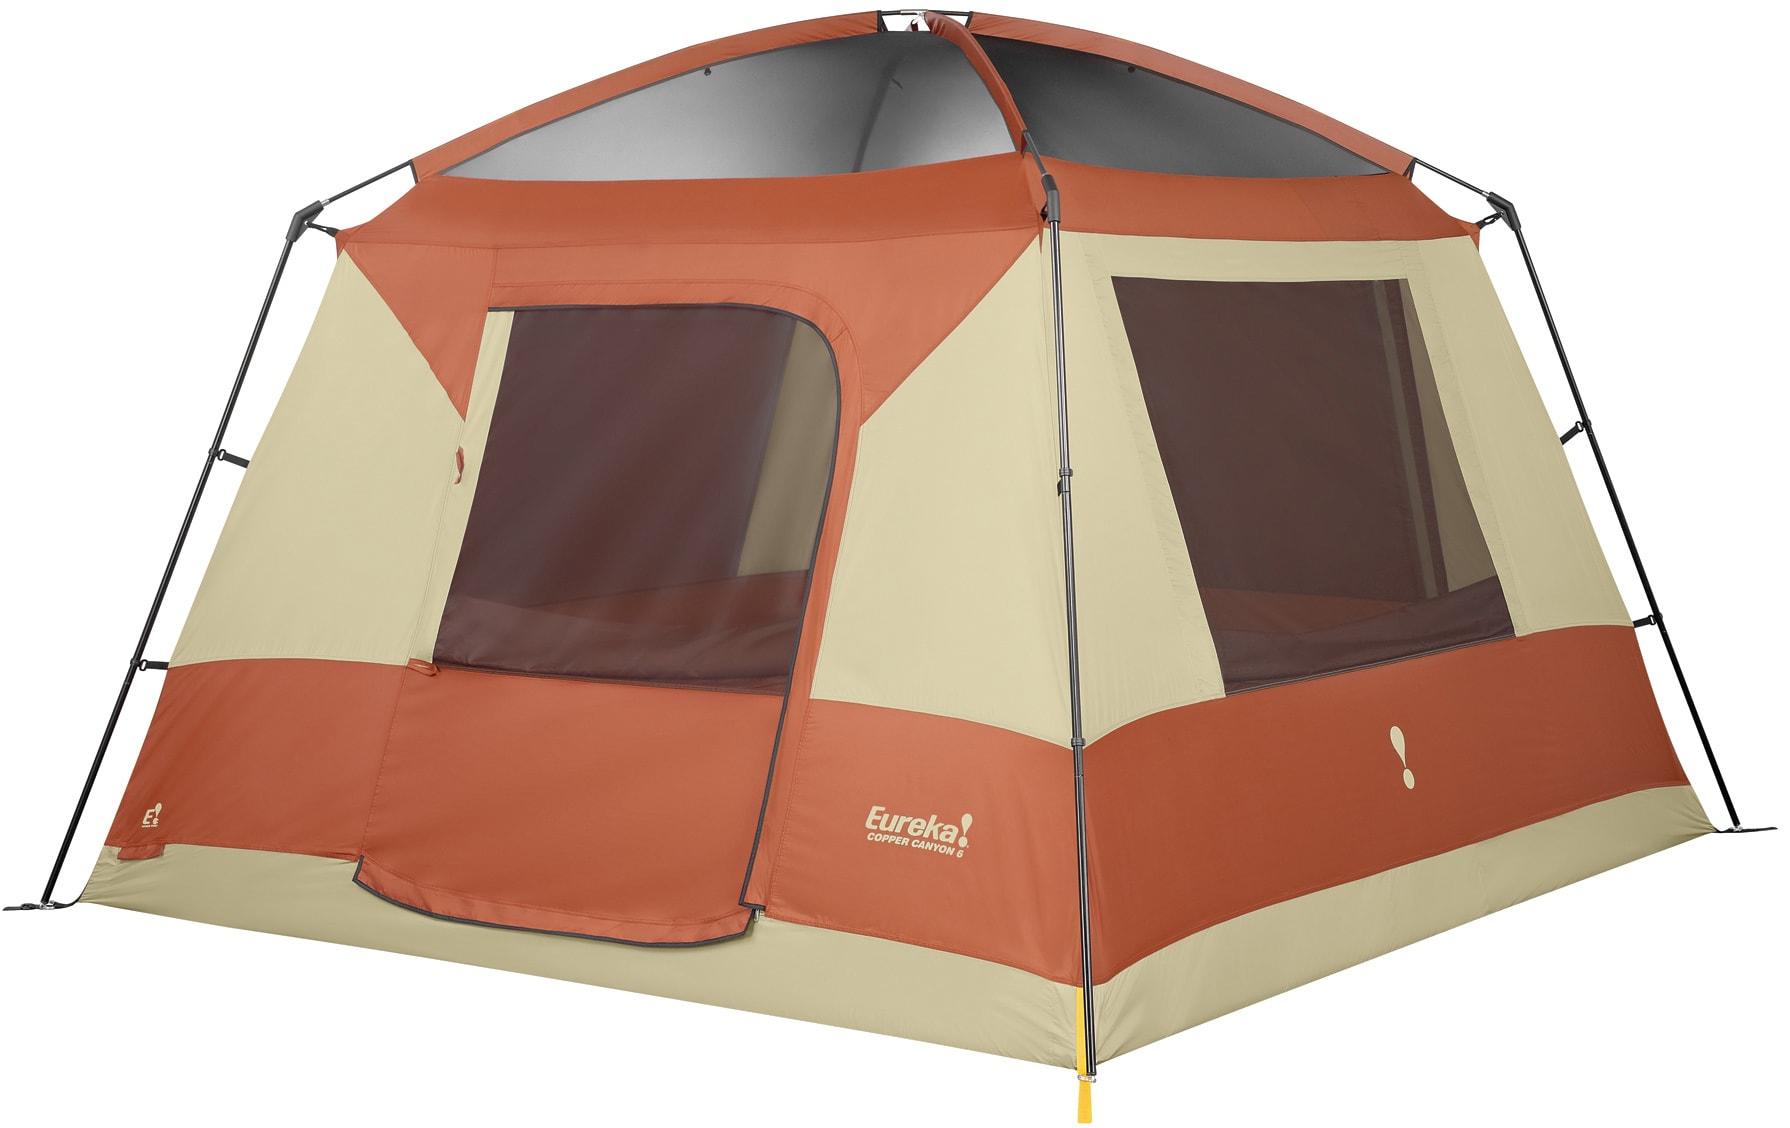 Eureka Copper Canyon 6 Tent 2018